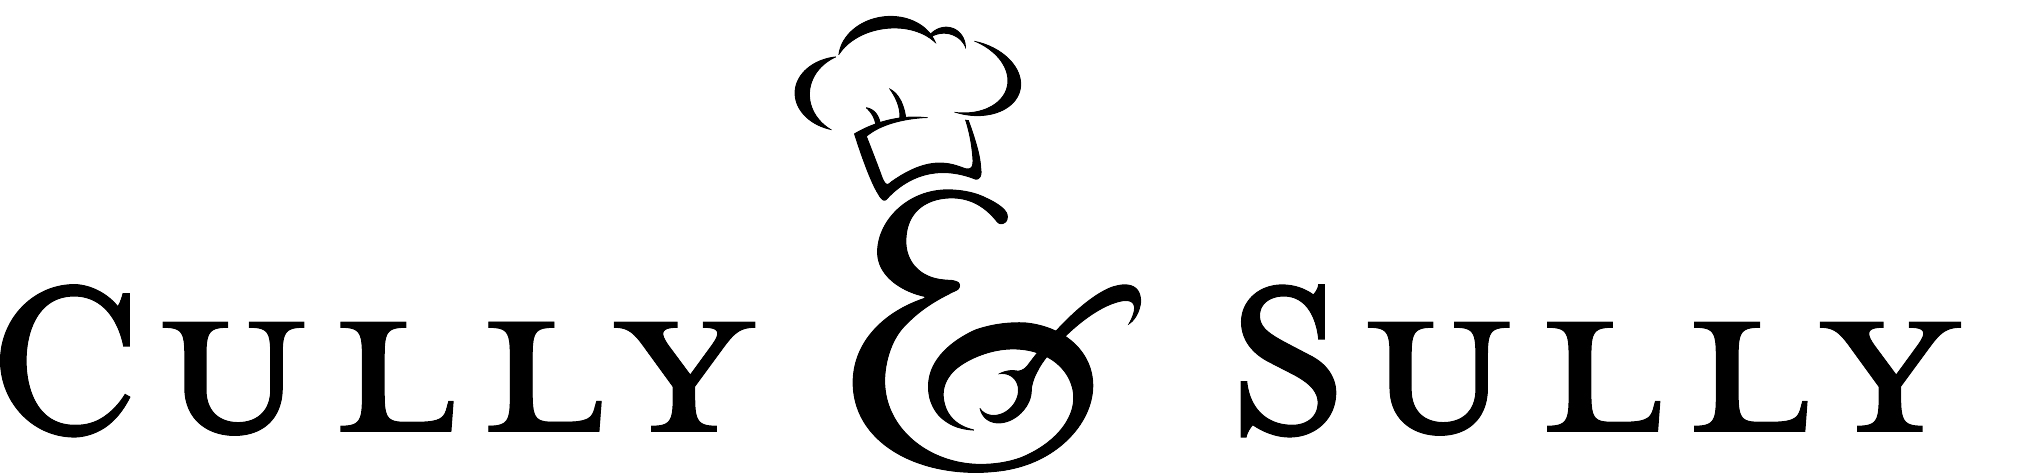 Cully & Sully logotype